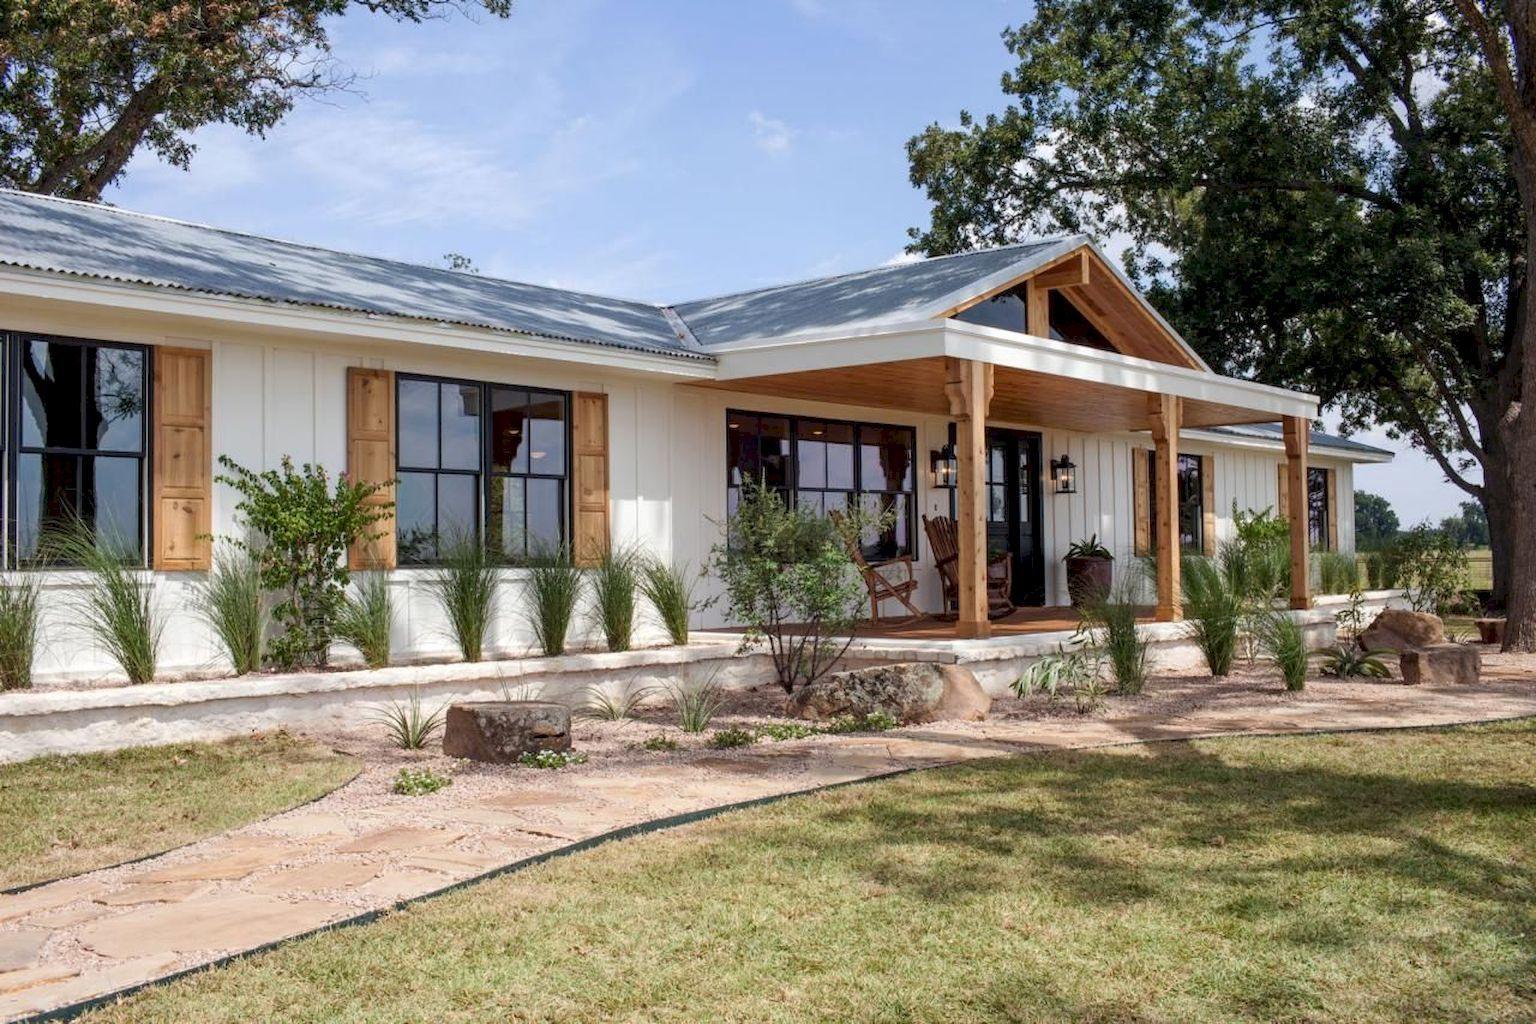 Cool 25 Modern Farmhouse Front Porch Decorating Ideas https